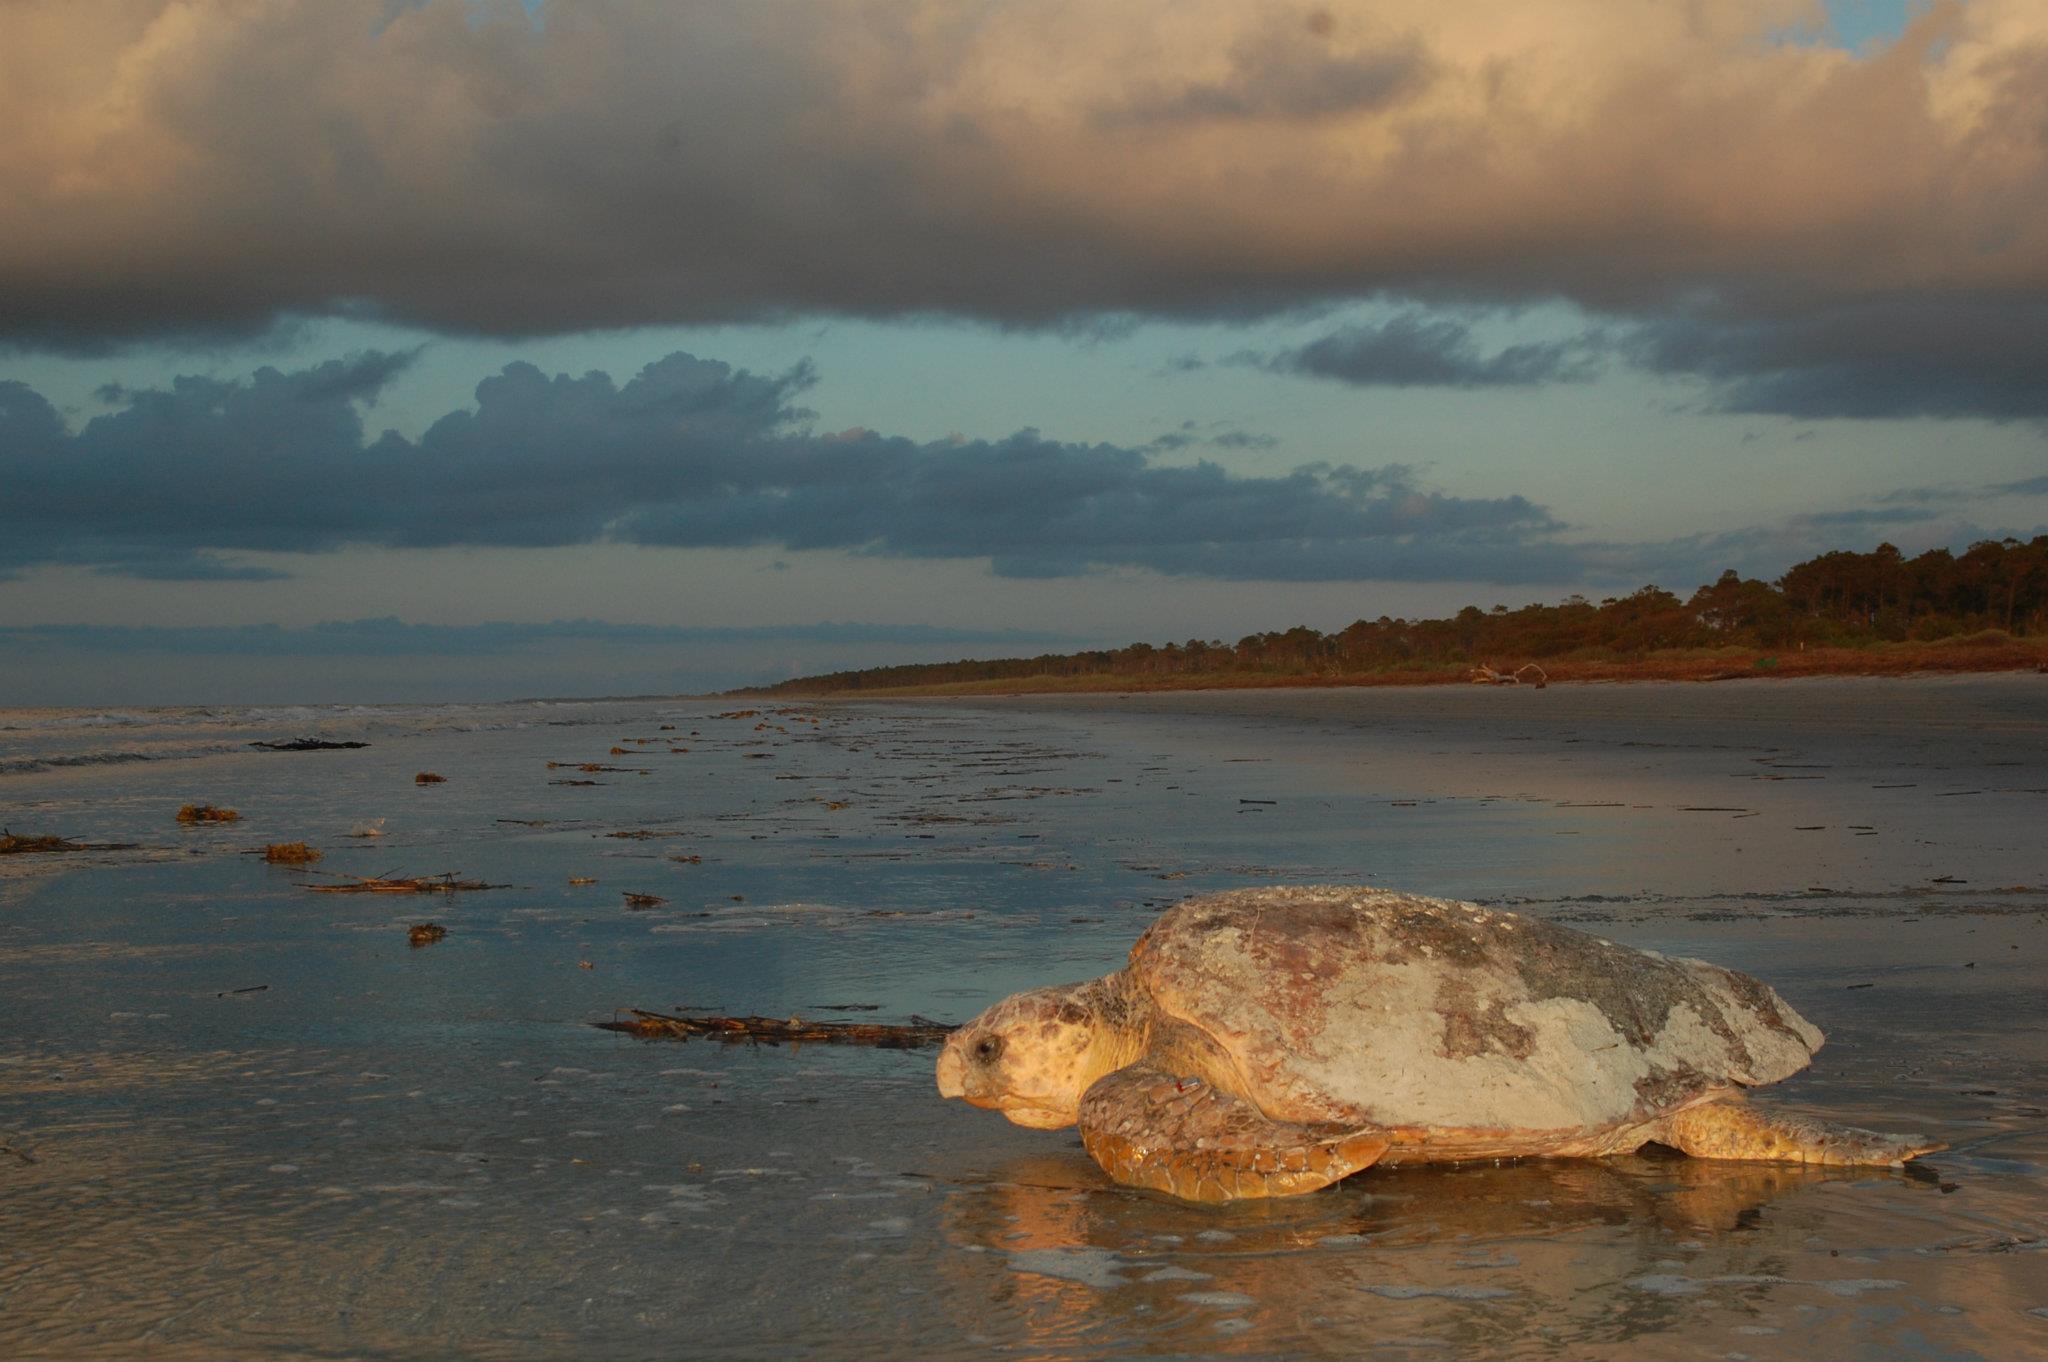 Summer Program - Marine Biology | Caretta Research Project